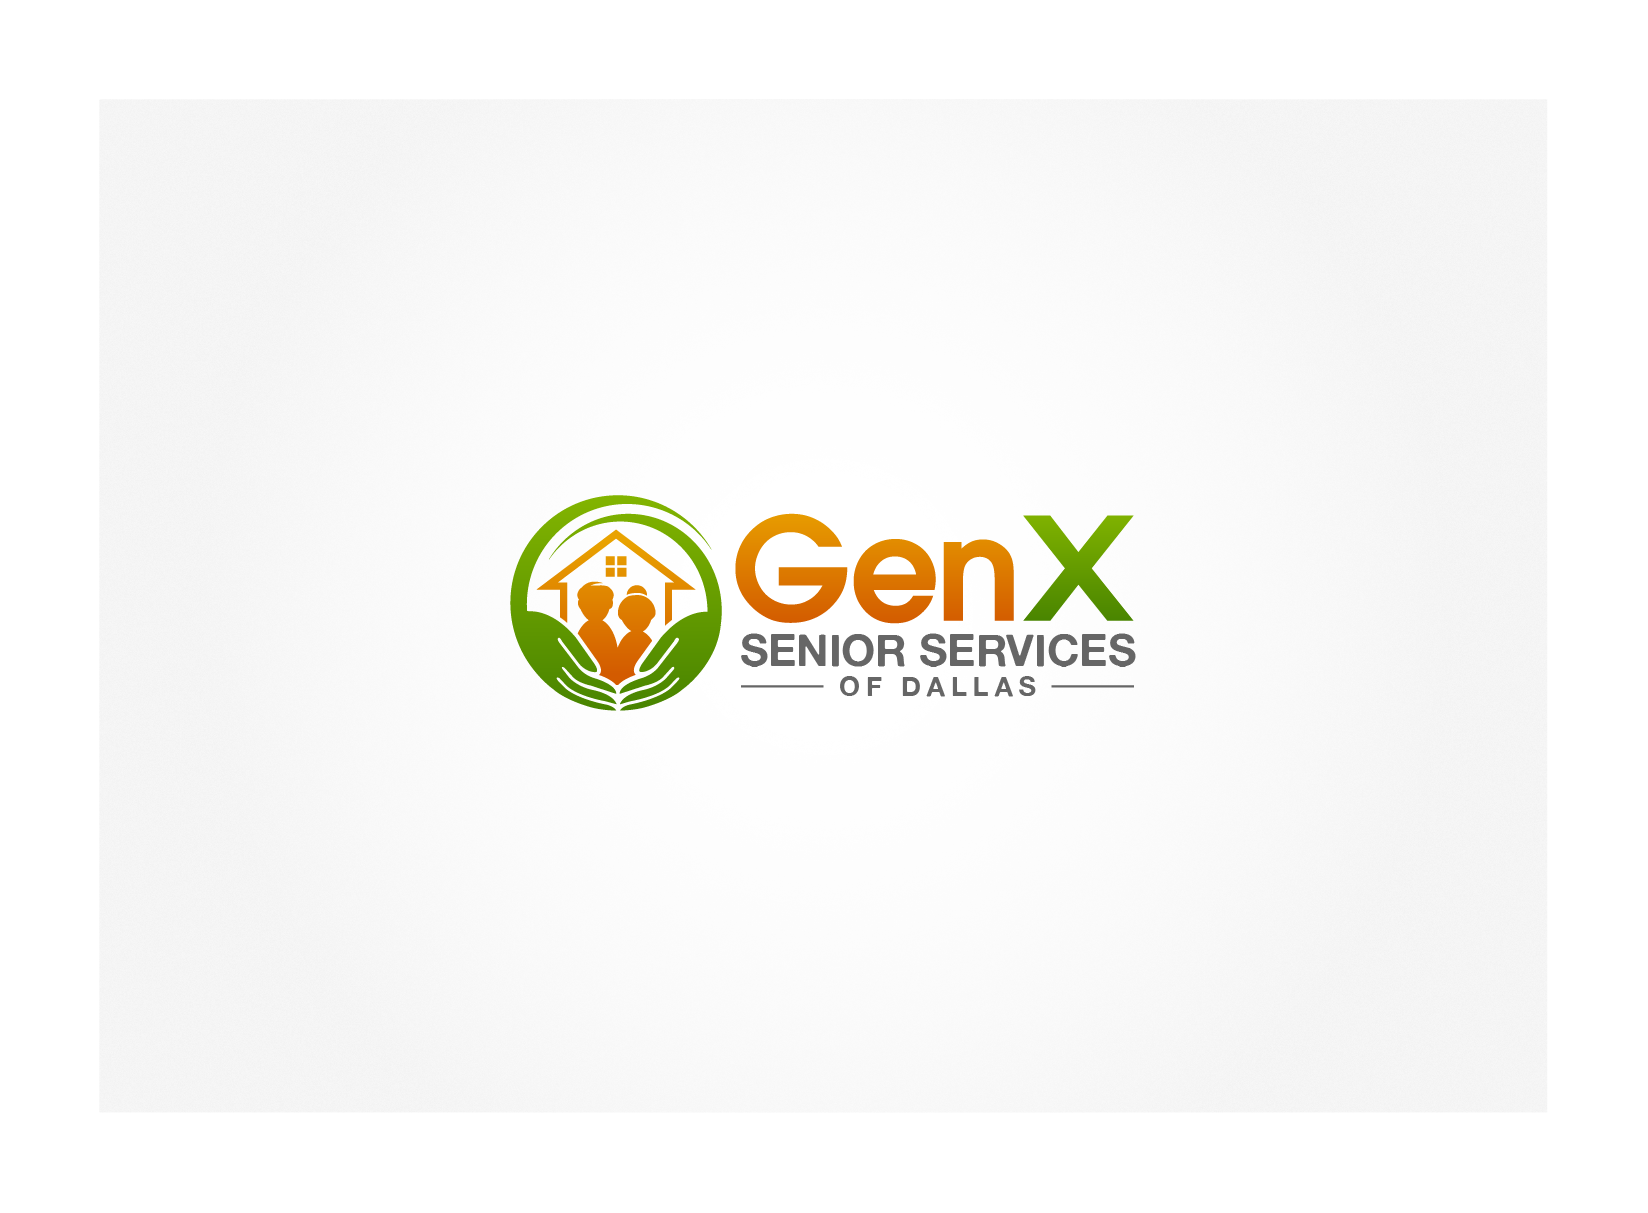 Create the next logo for GenX Senior Services of Dallas